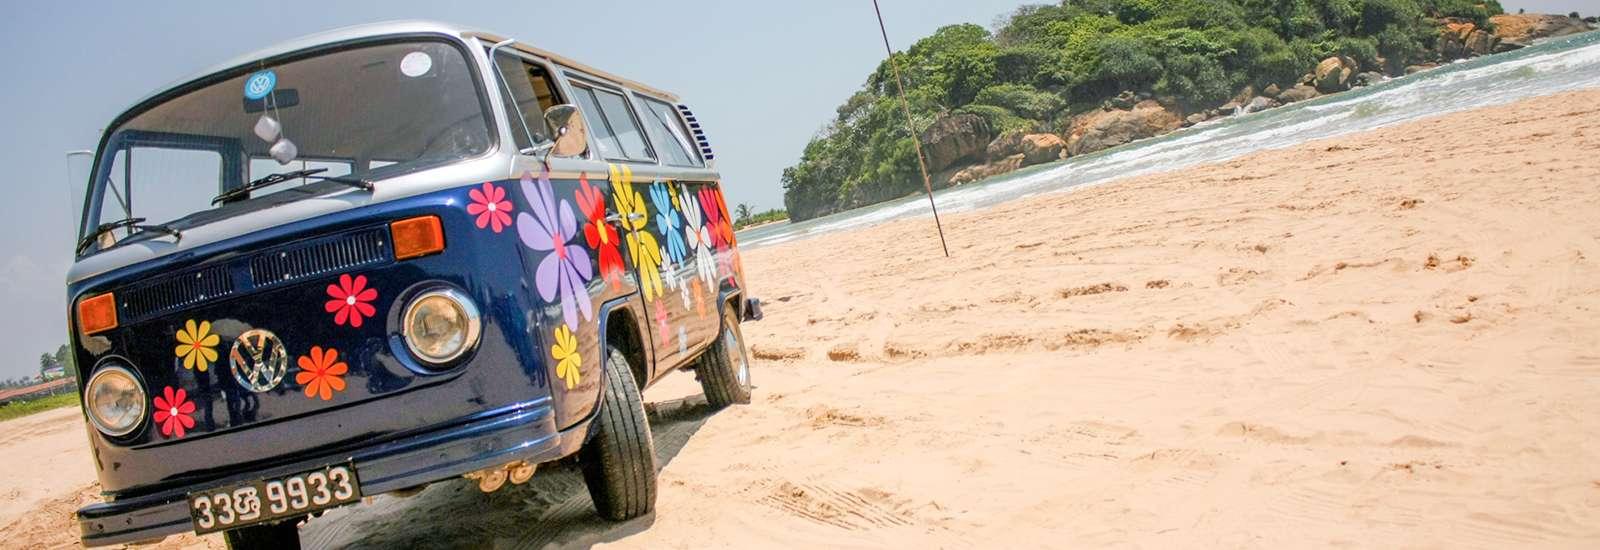 Sri Lanka Car Rental   Malkey Rent A Car Colombo   Official Site